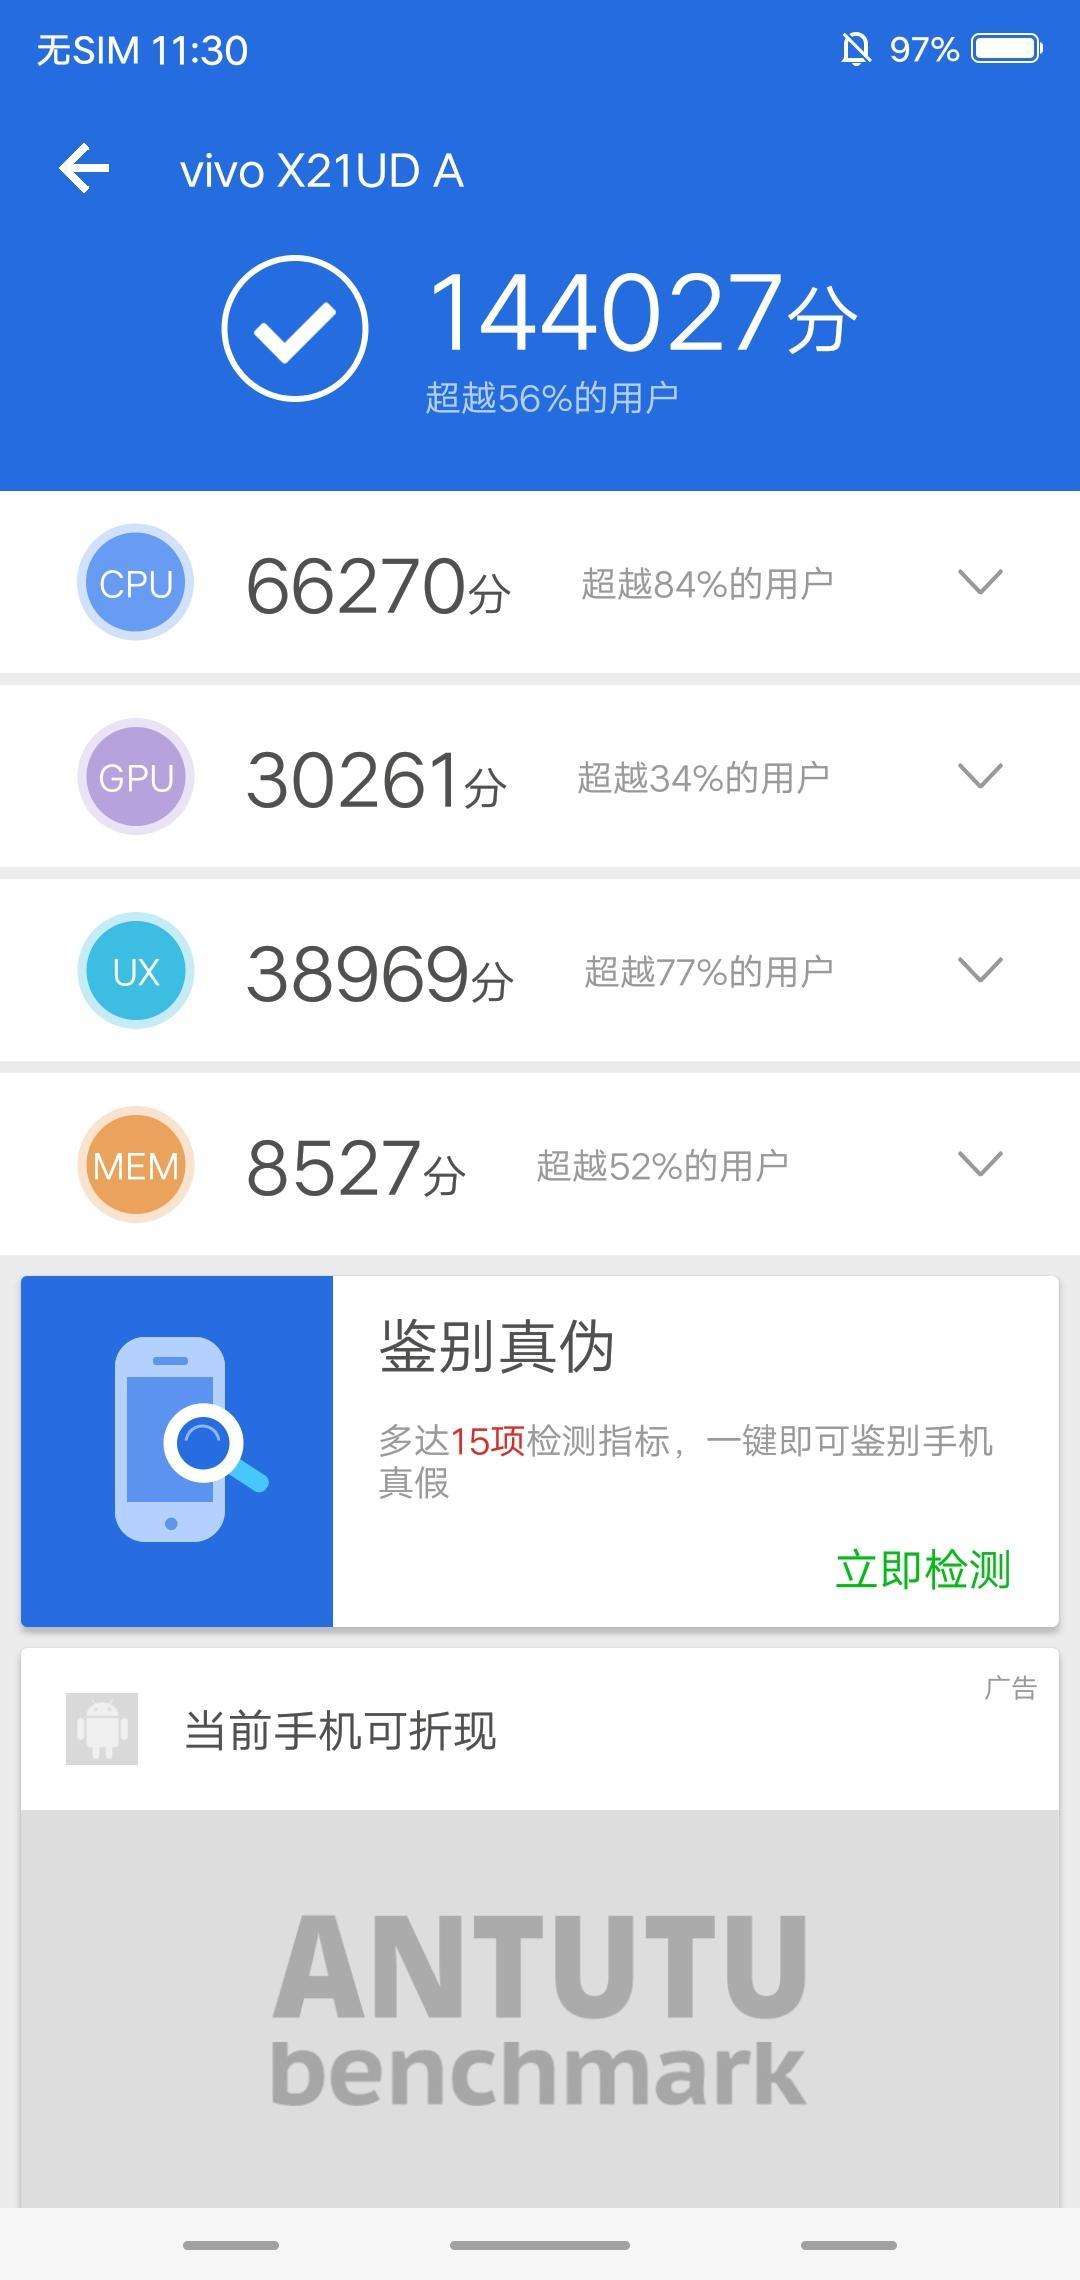 【vivoX20深度评测】vivoX20性能跑分评测_拍照评测... _手机中国